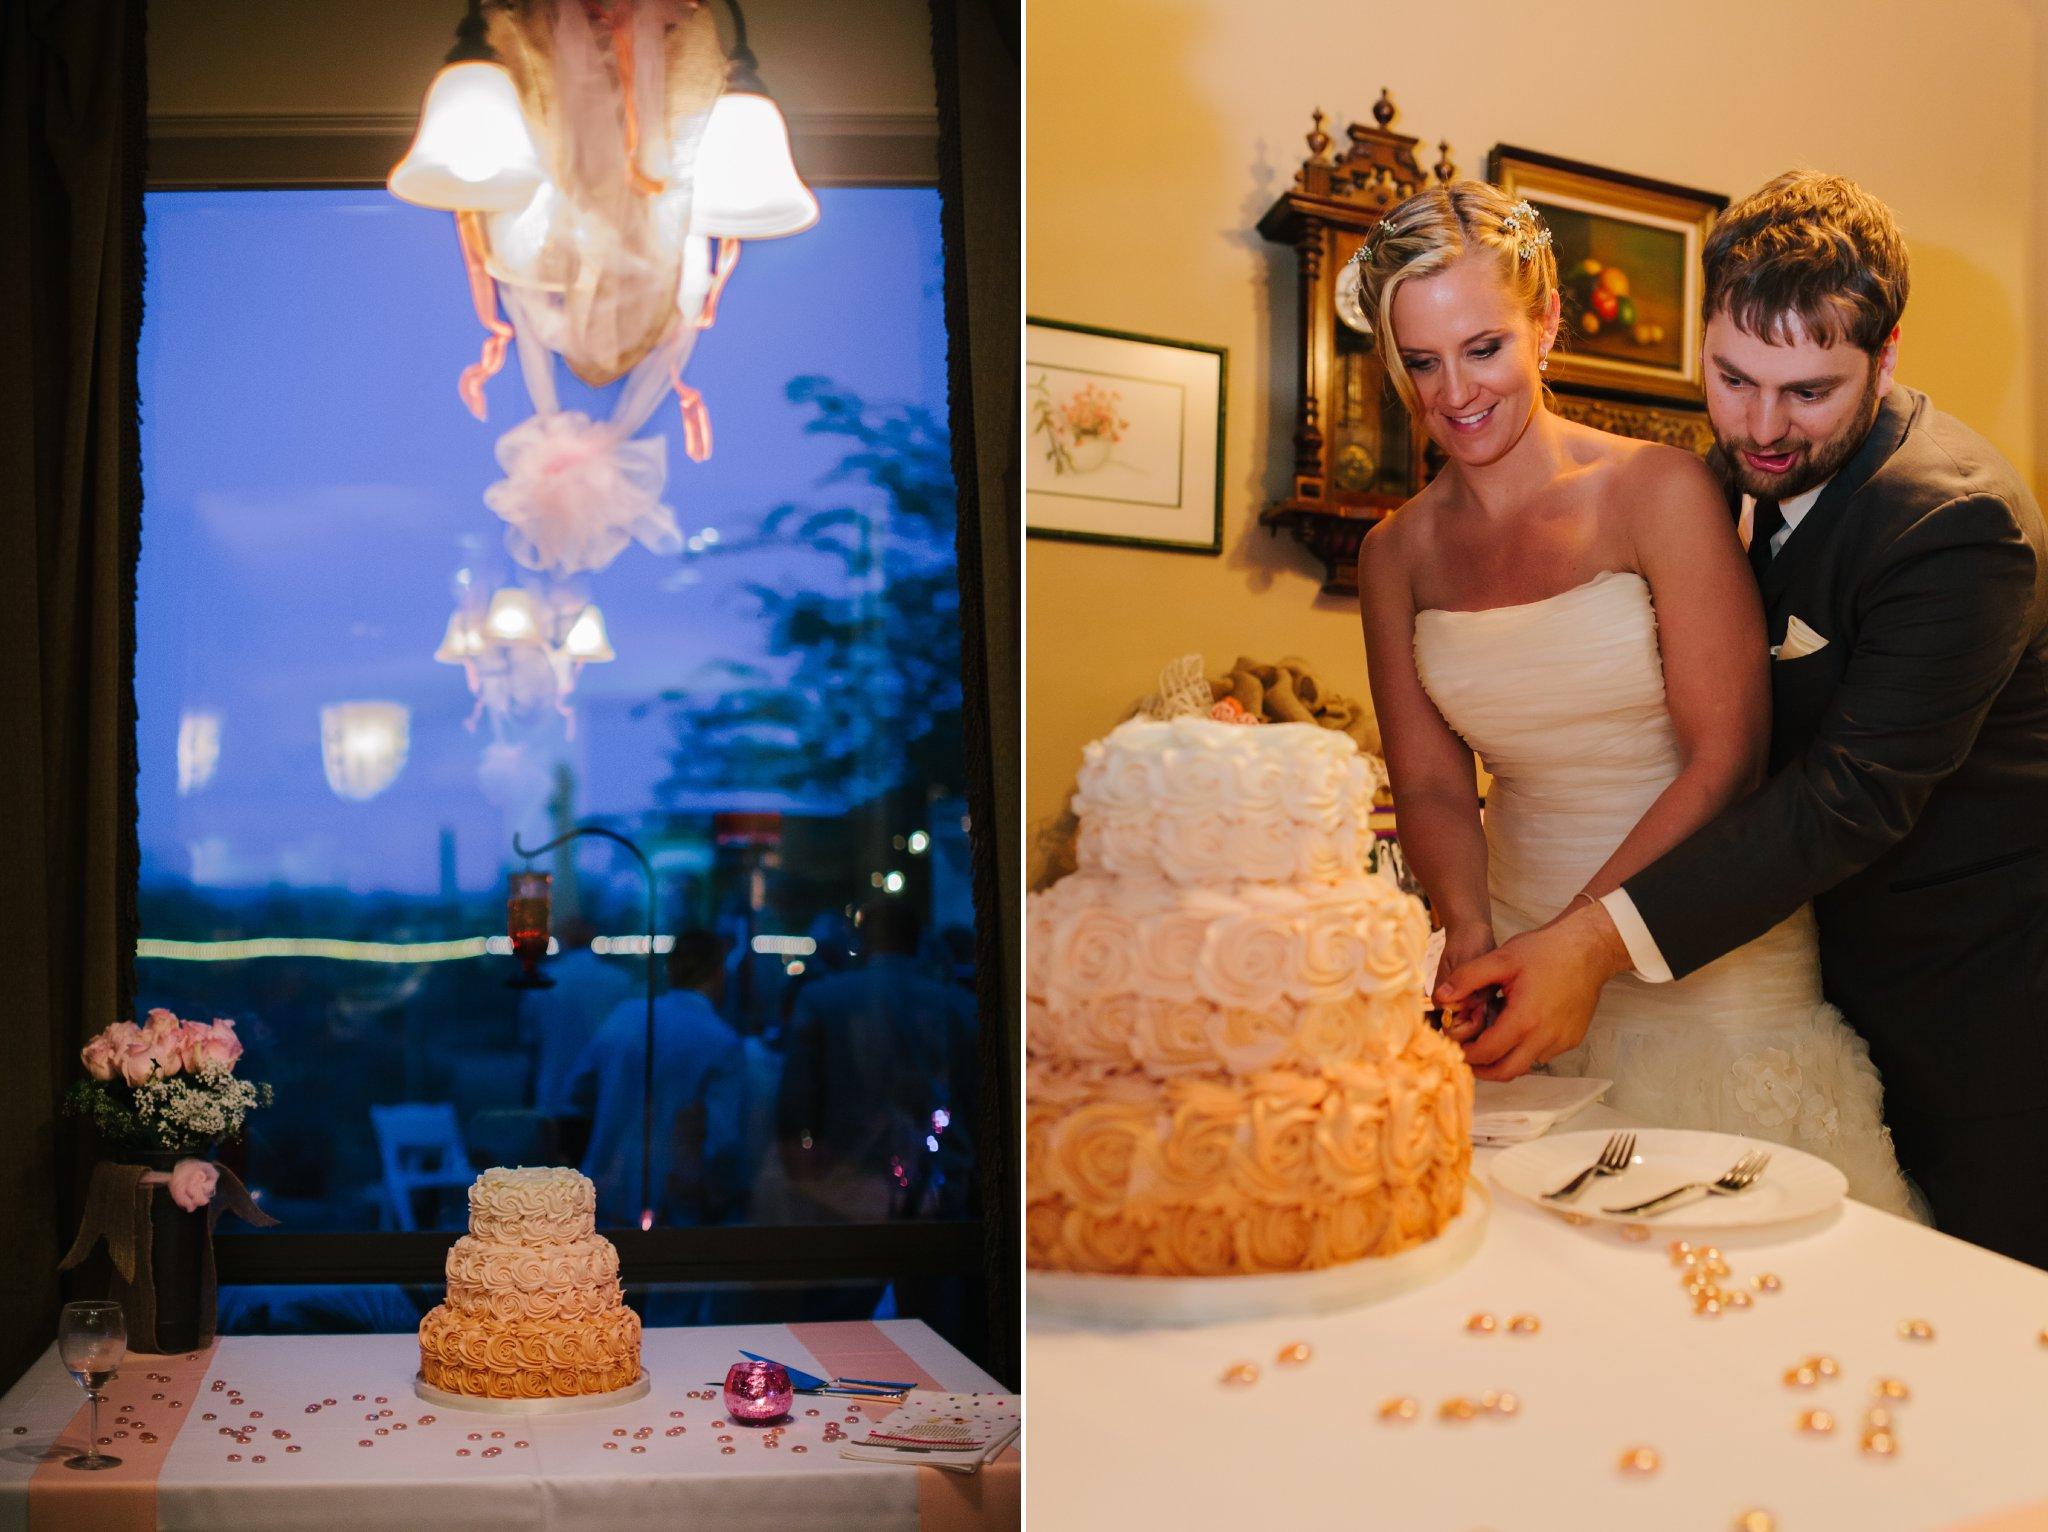 Mesa backyard wedding cake cutting